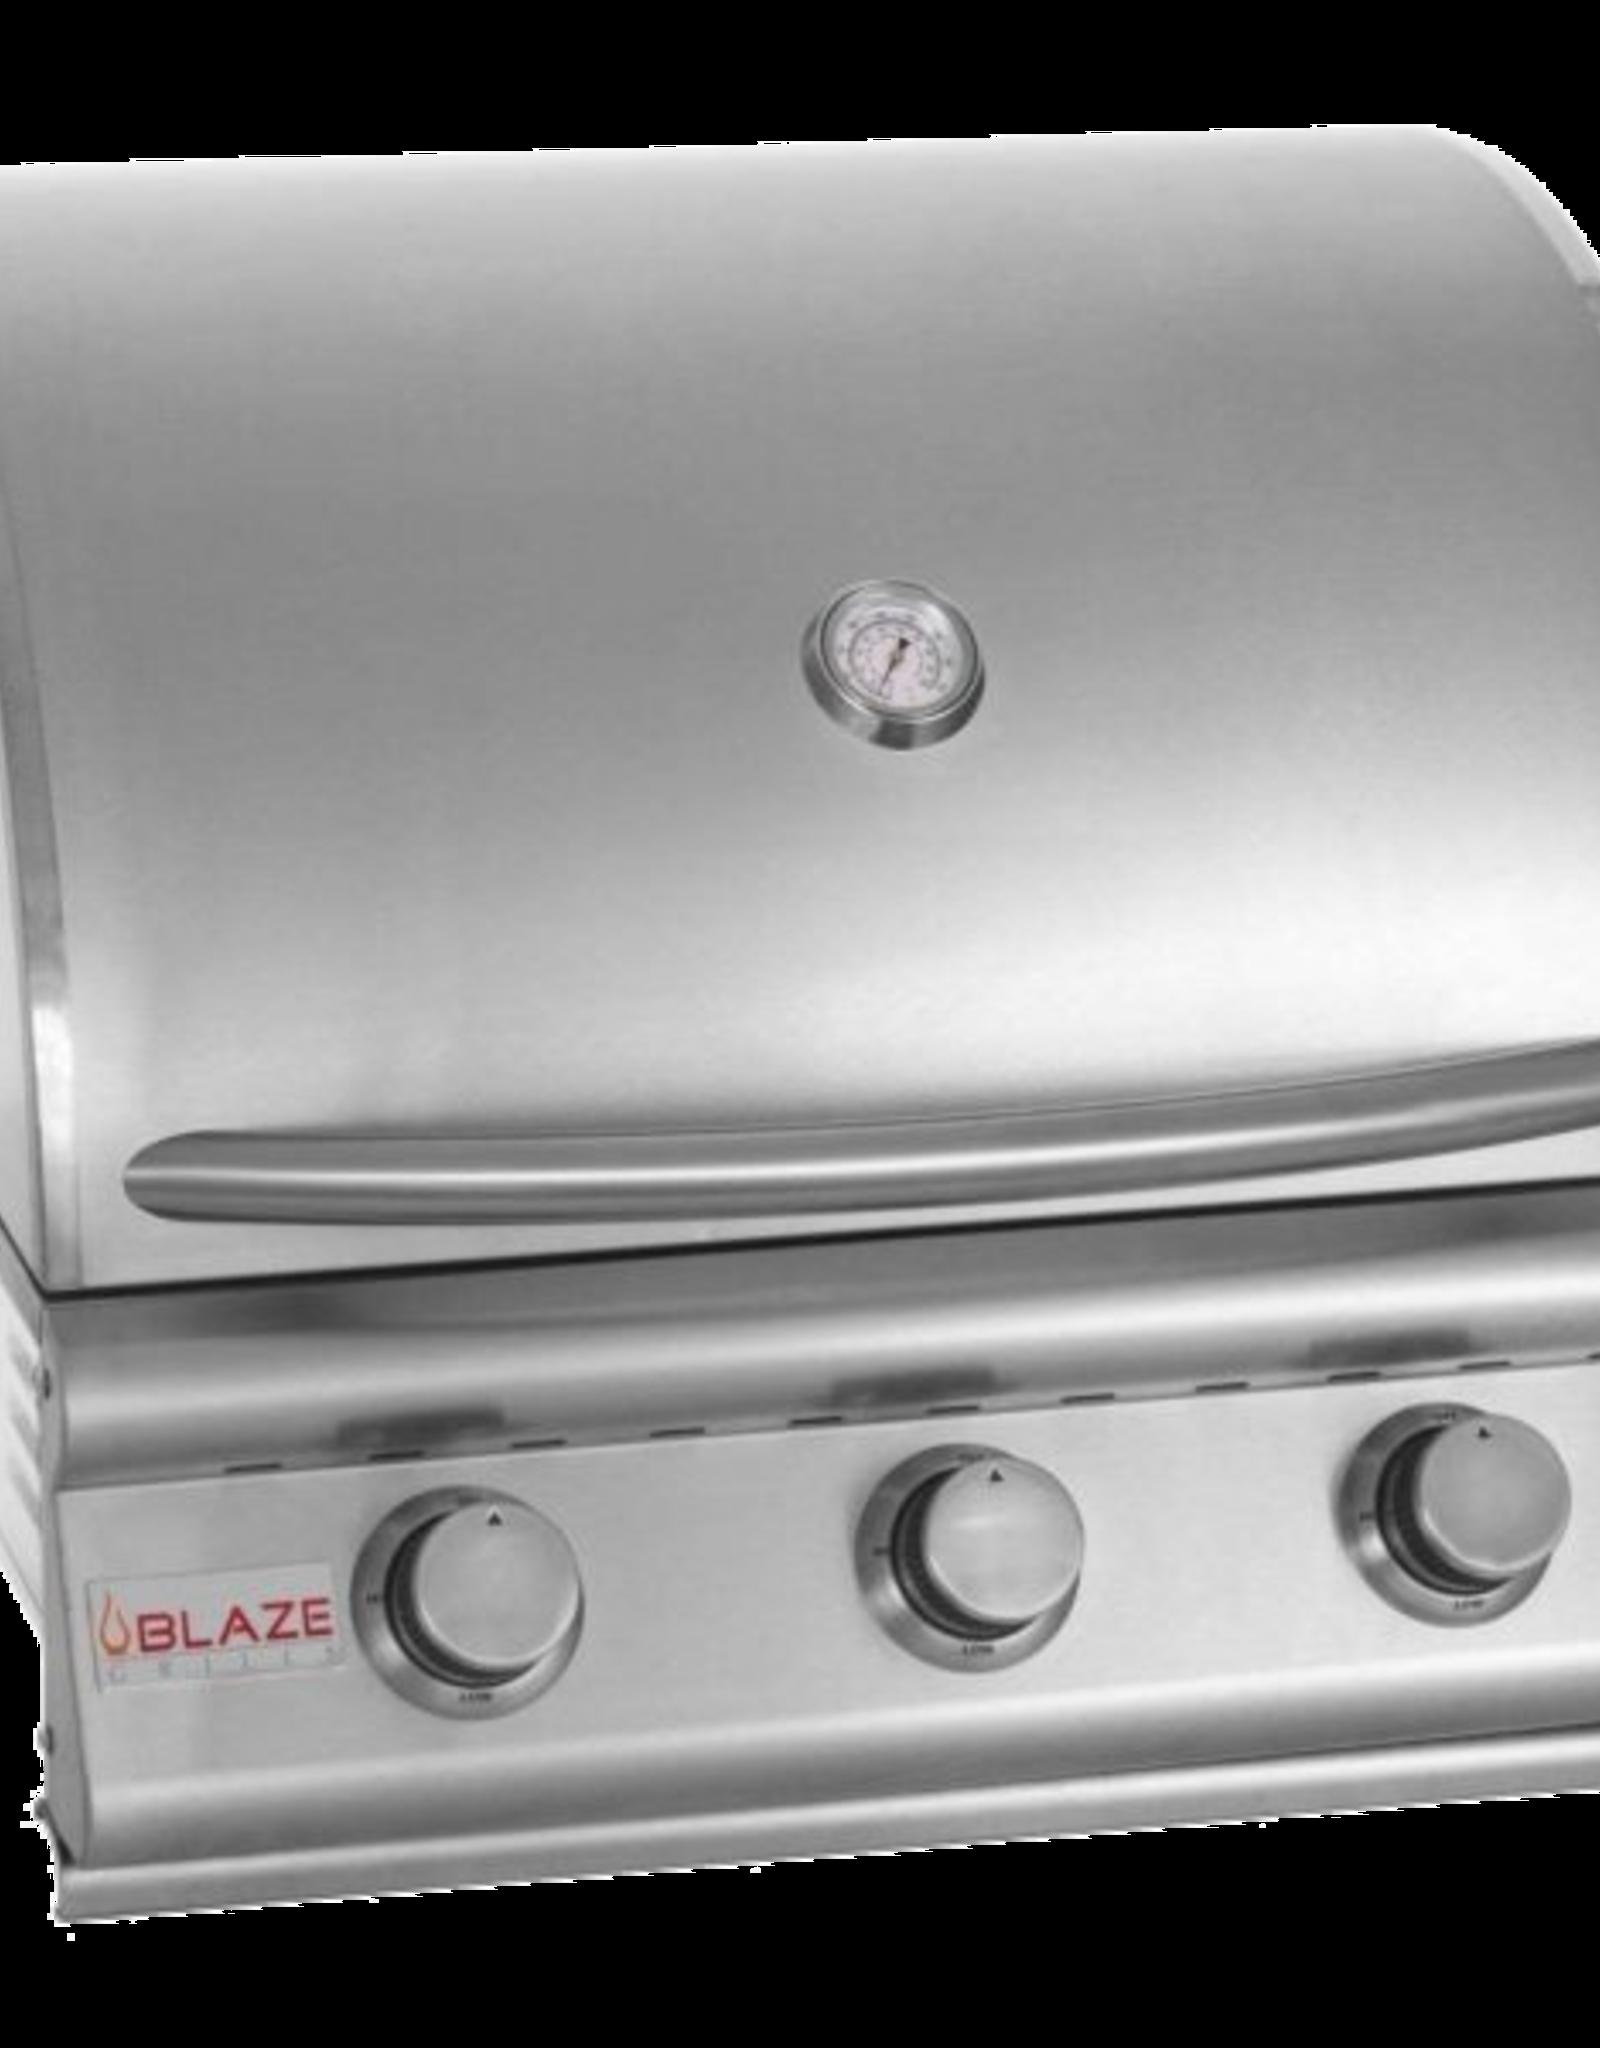 Blaze Outdoor Products Blaze Prelude LBM 25-Inch 3-Burner Built-In Propane Gas Grill - BLZ-3LBM-LP